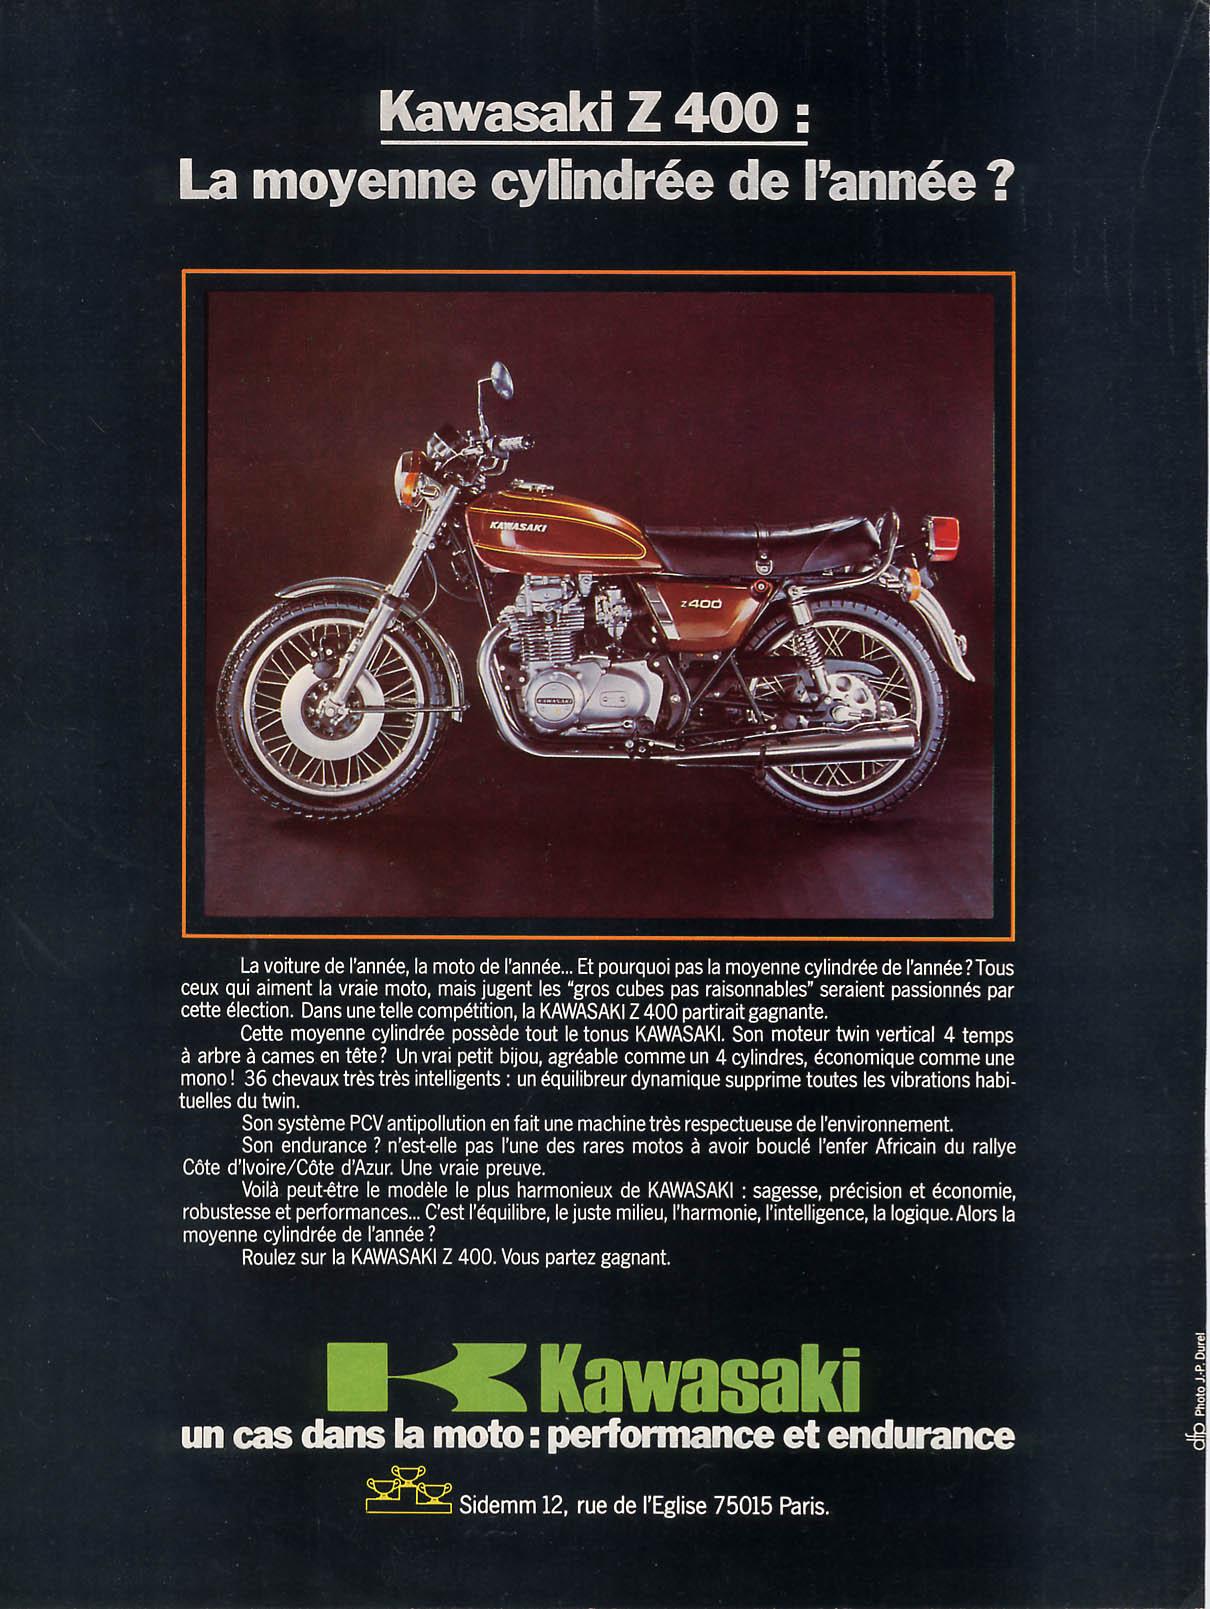 brochure kz400 marron  france 1976.JPG